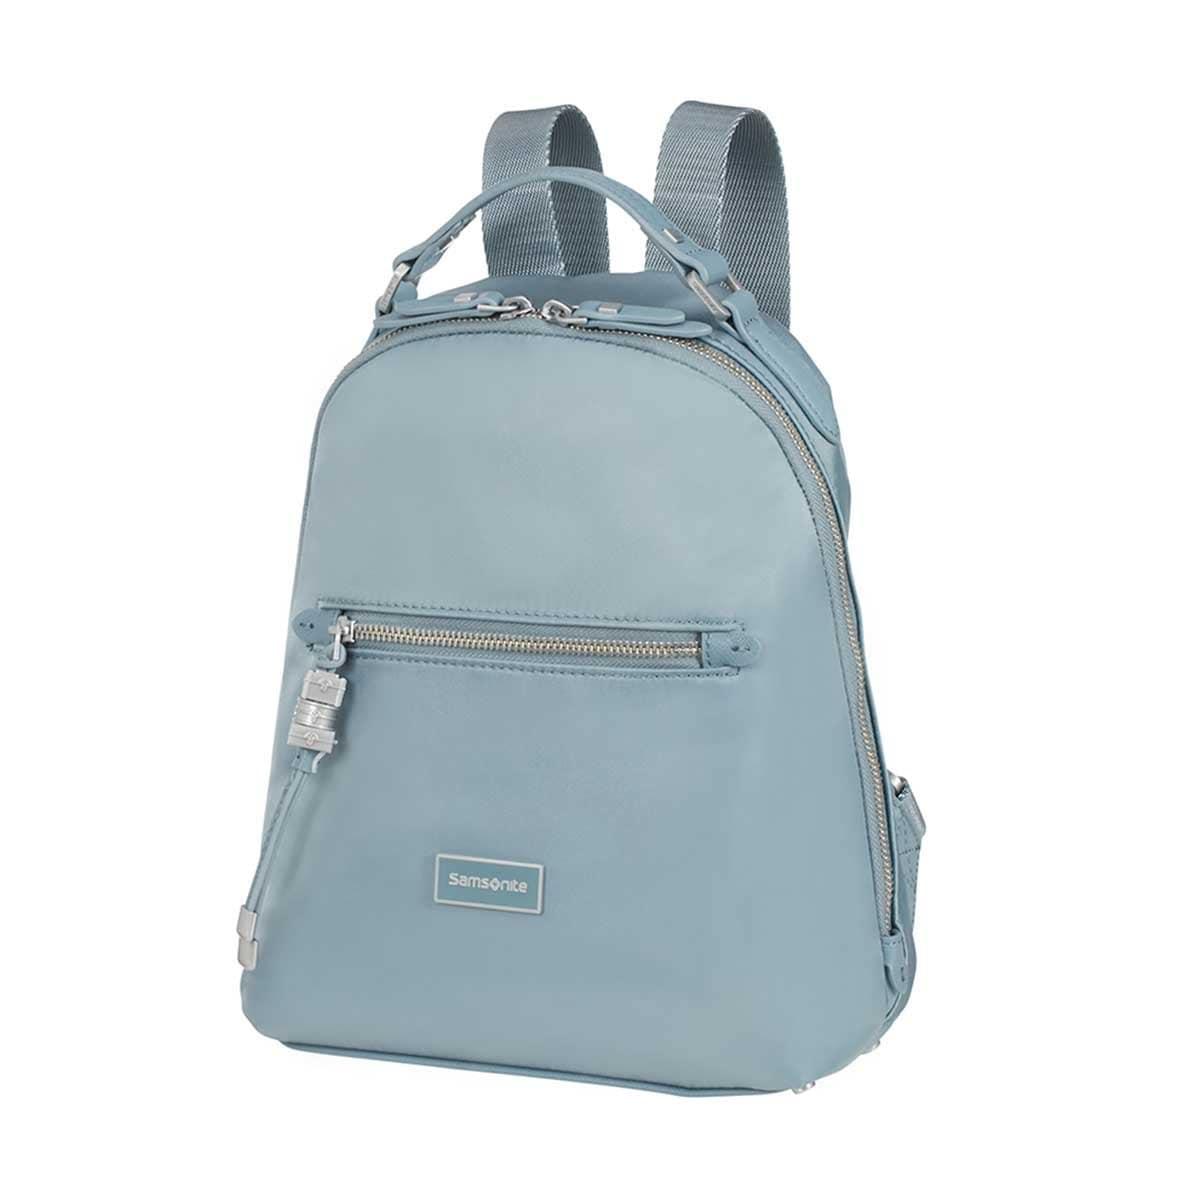 Backpack Dusty Blue Karissa Samsonite